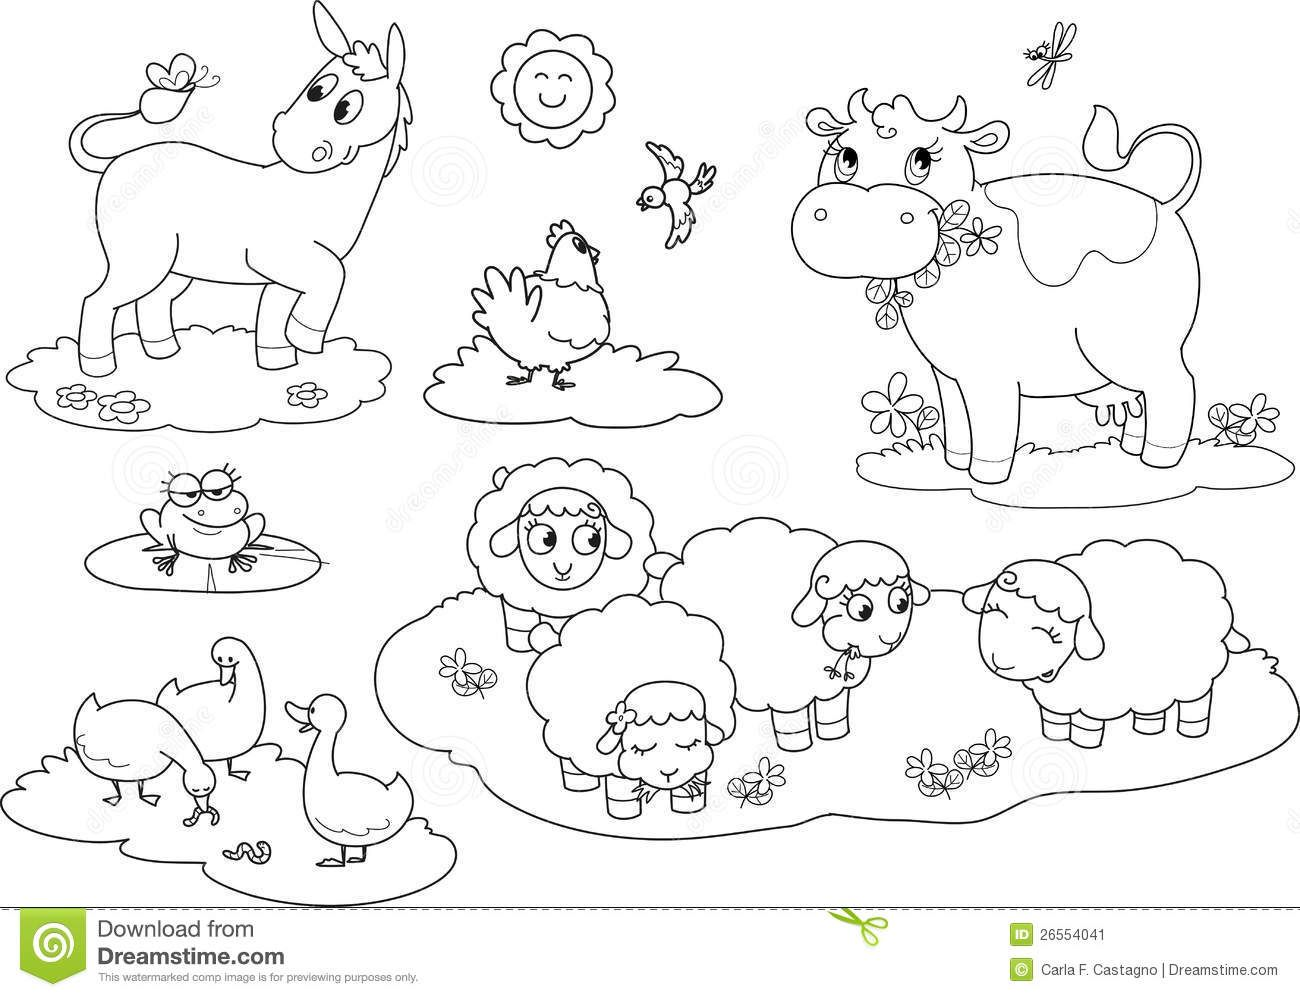 Alphabet Coloring Pages | Letter R - Free printable farm ABC ... | 997x1300